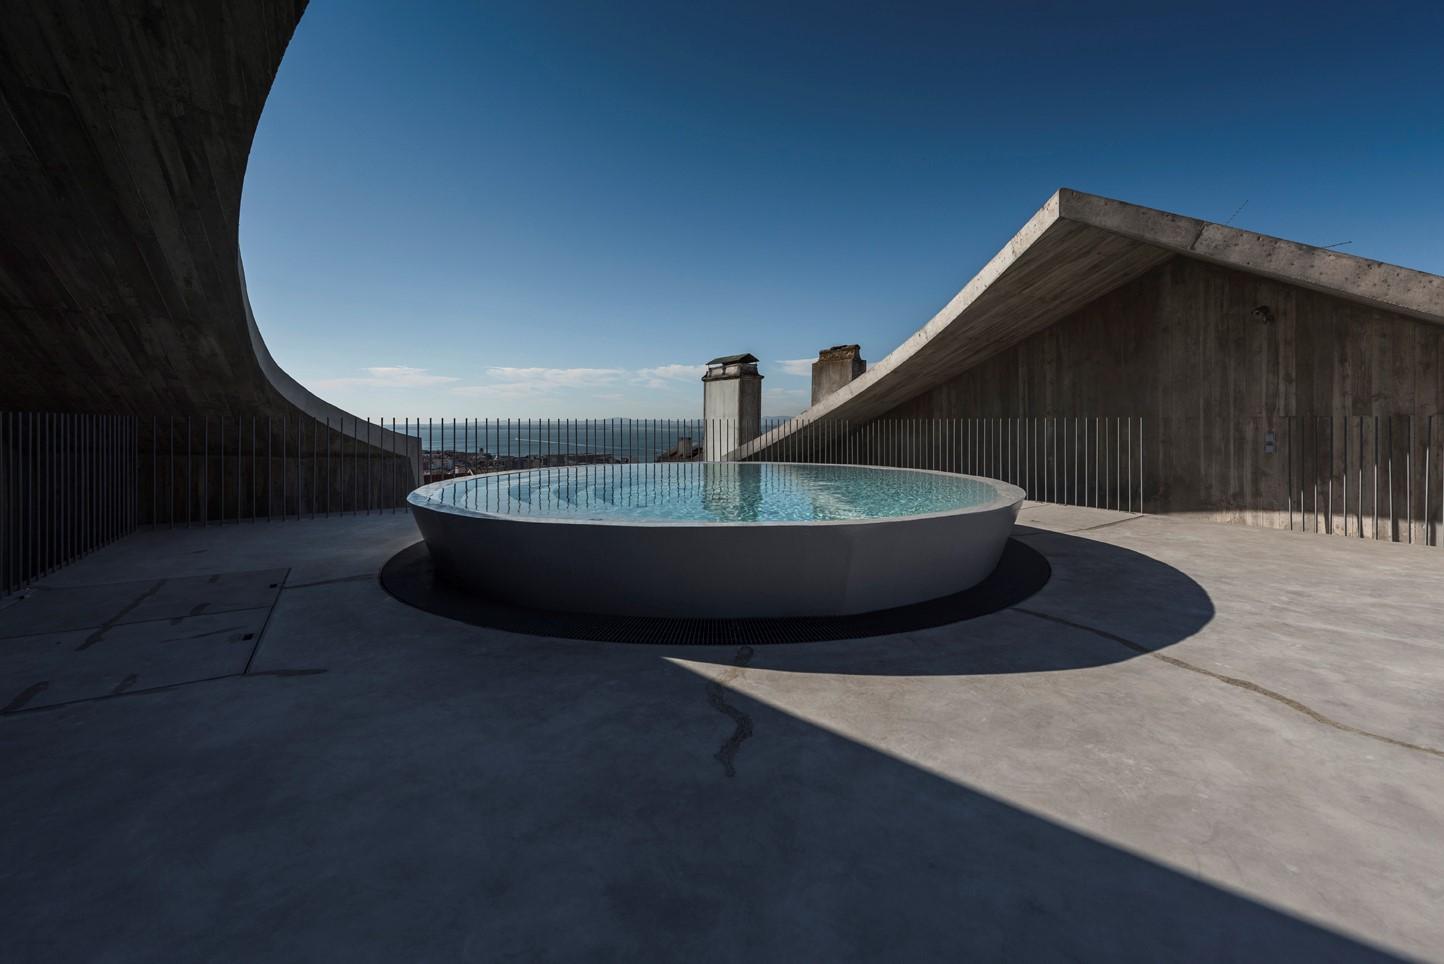 Aires Mateus | U形开口式混凝土住宅